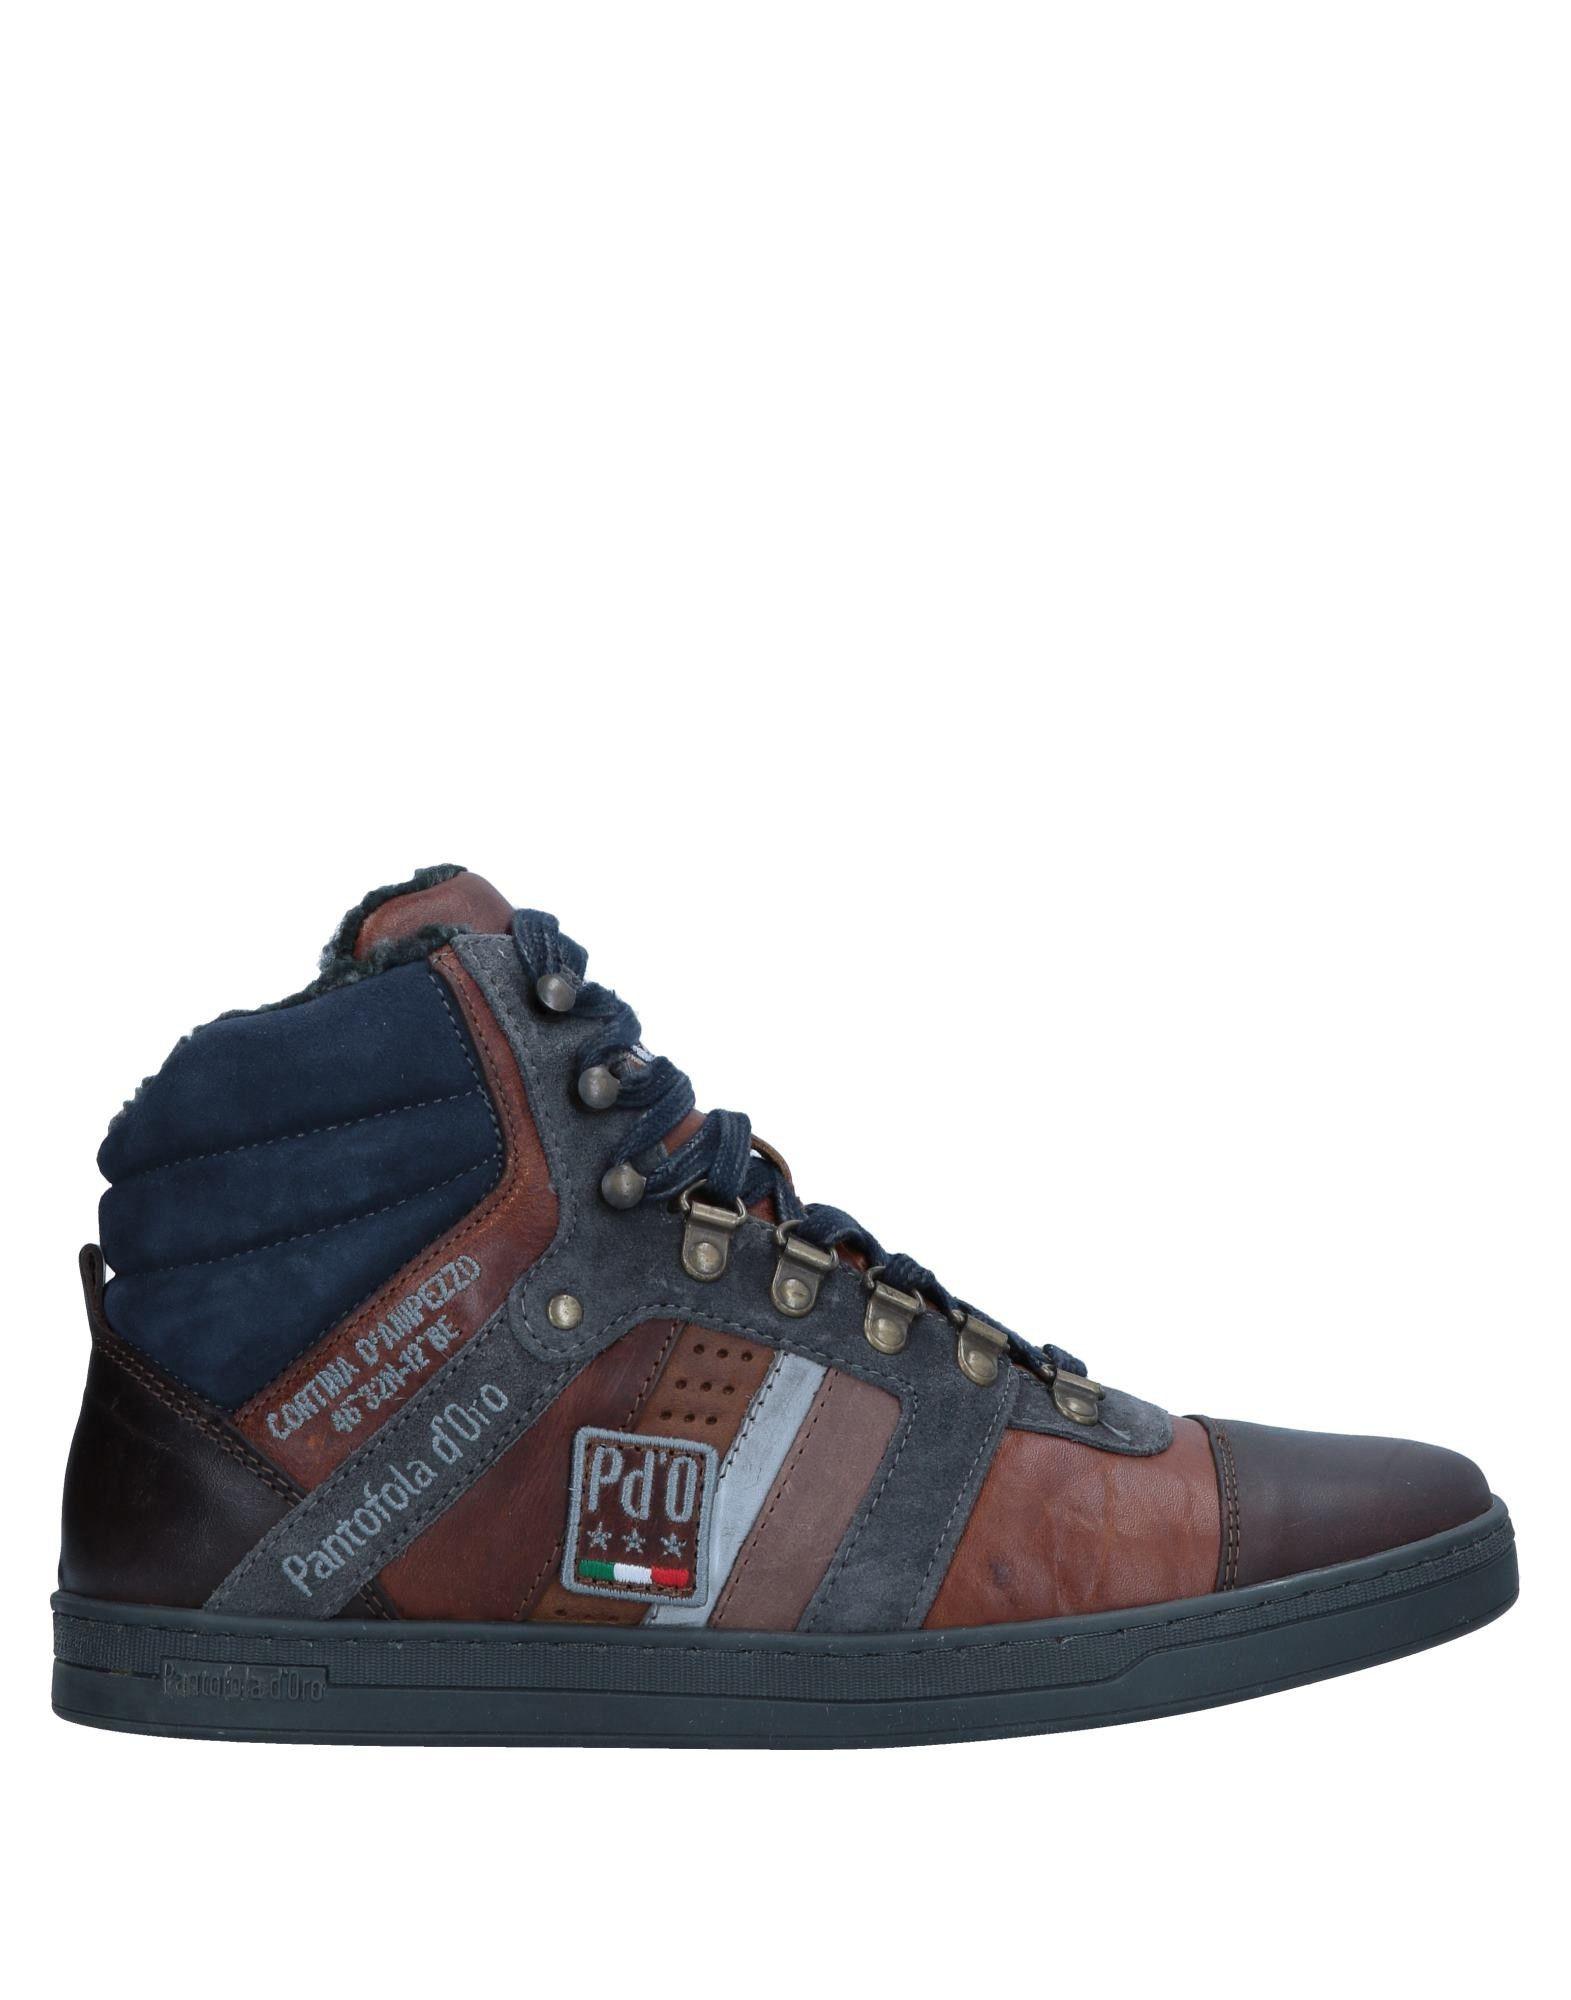 Rabatt echte Schuhe Pantofola D'oro Stiefelette Herren  11545452TB